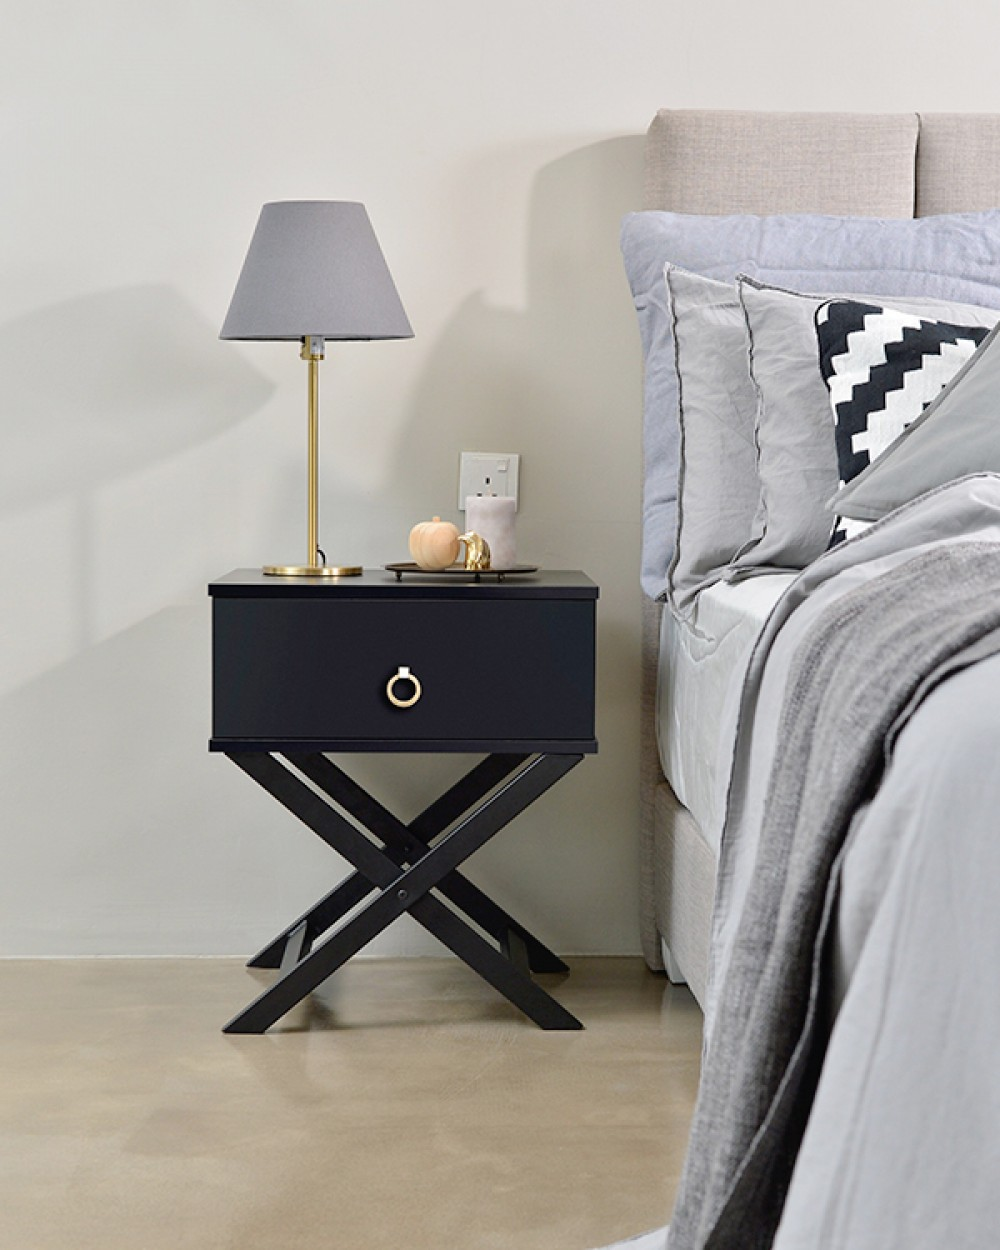 Twints Bedside Table